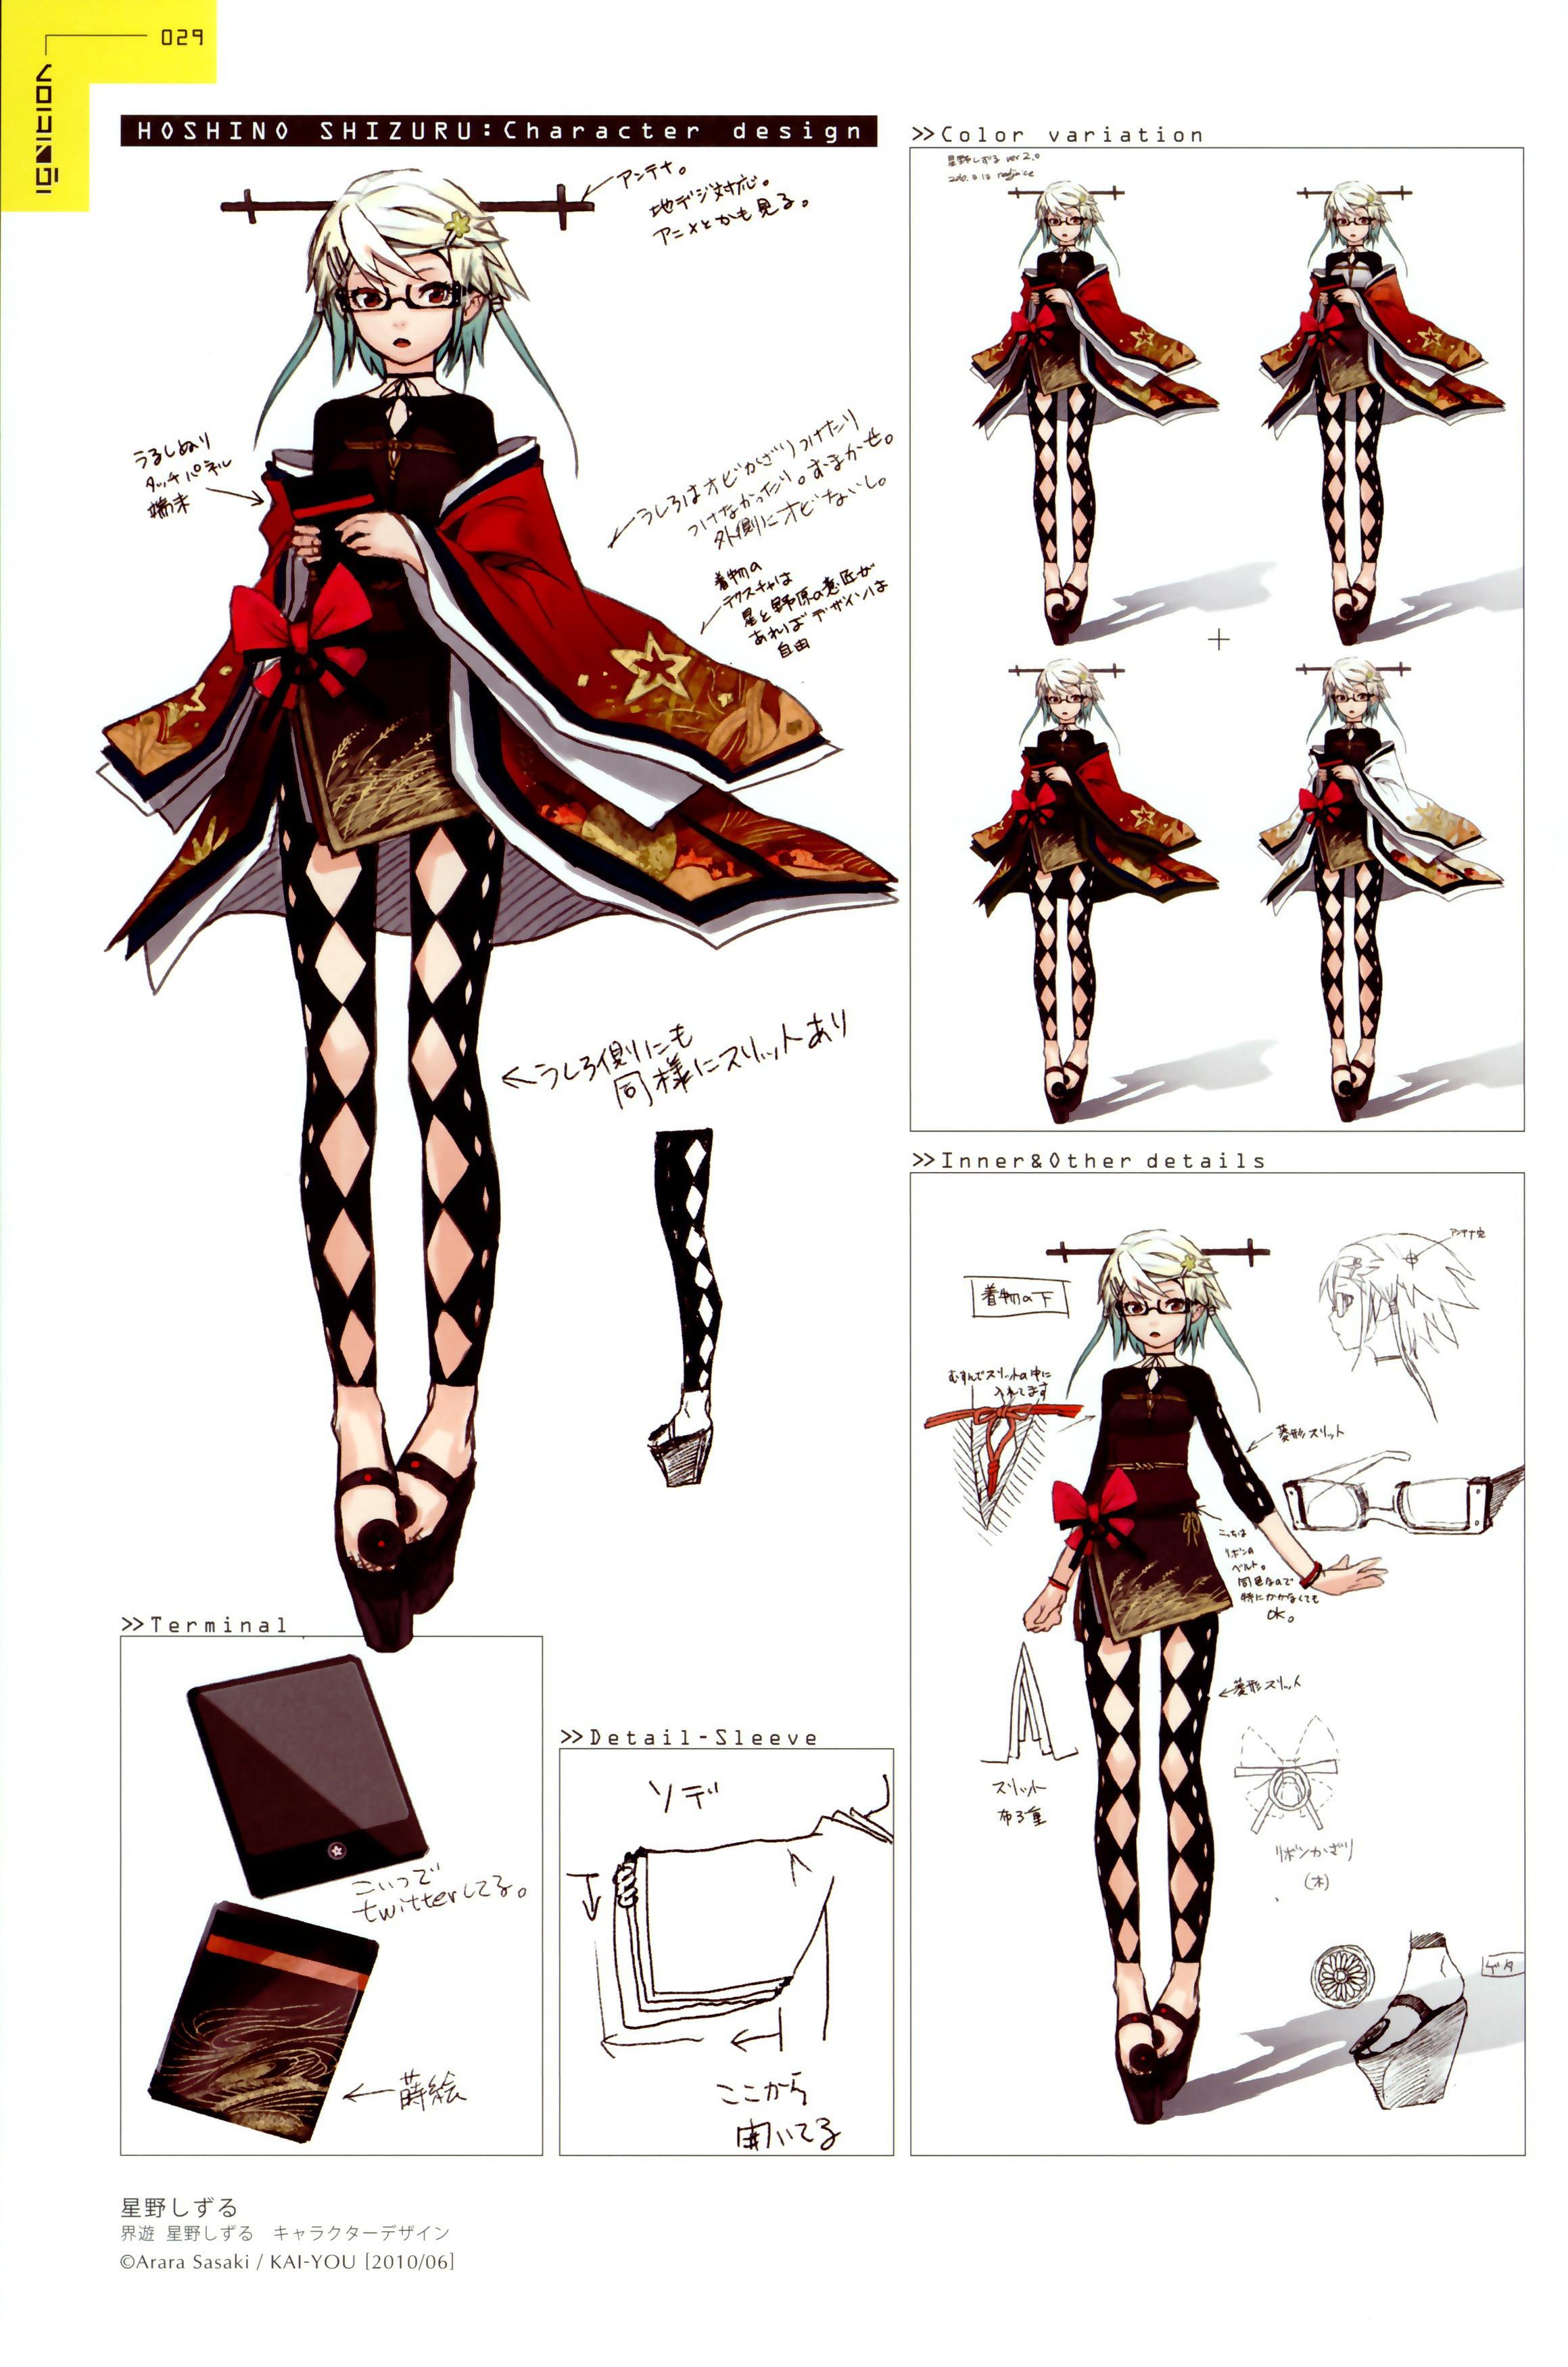 Character Design Zerochan : Hoshino shizuru redjuice zerochan anime image board